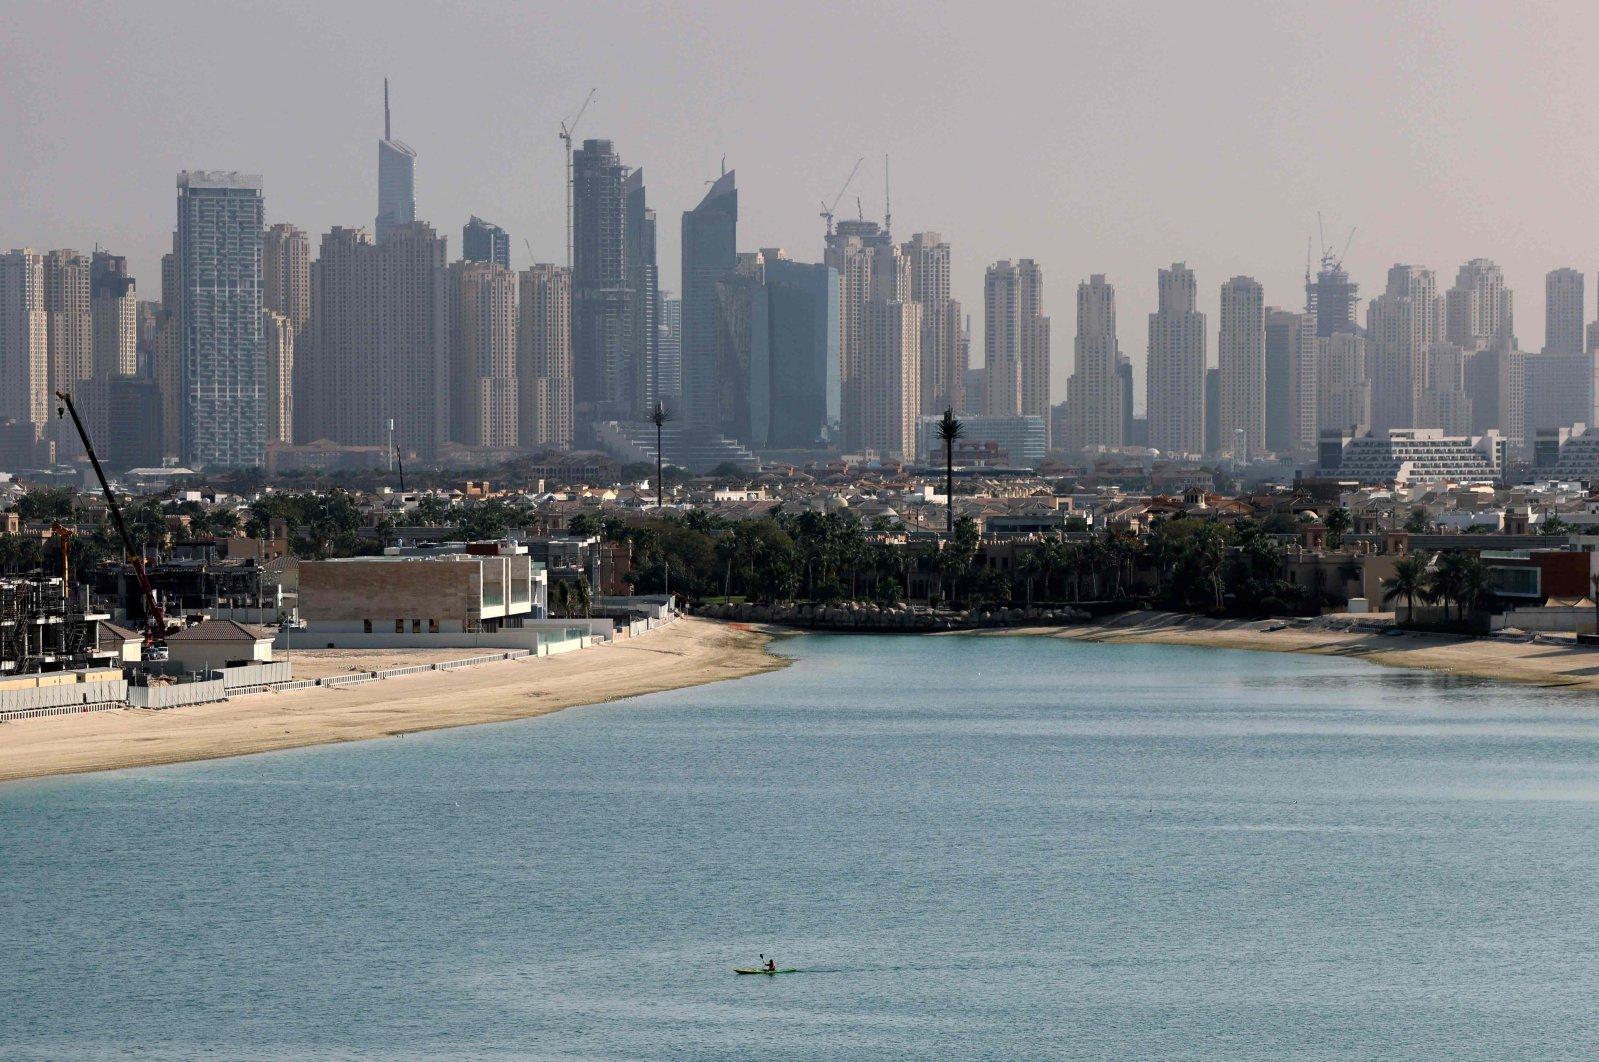 A view of the manmade archipelago of Palm Jumeira, in Dubai, United Arab Emirates (UAE), Feb. 24, 2021. (AFP Photo)